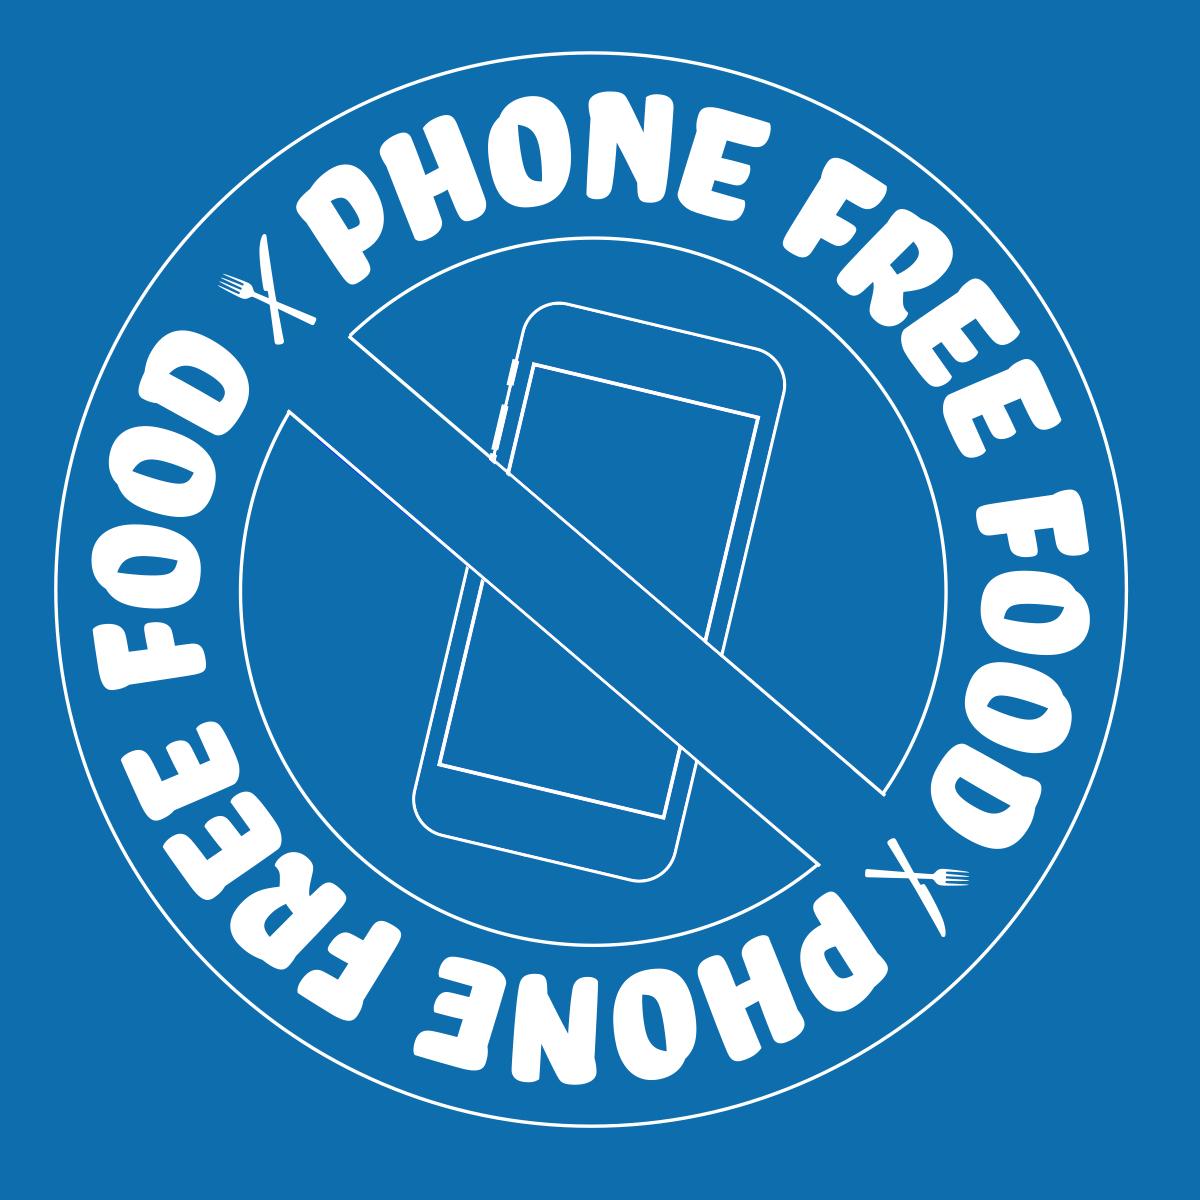 Phone Free Food: Nominate a Digital Detox Restaurant!